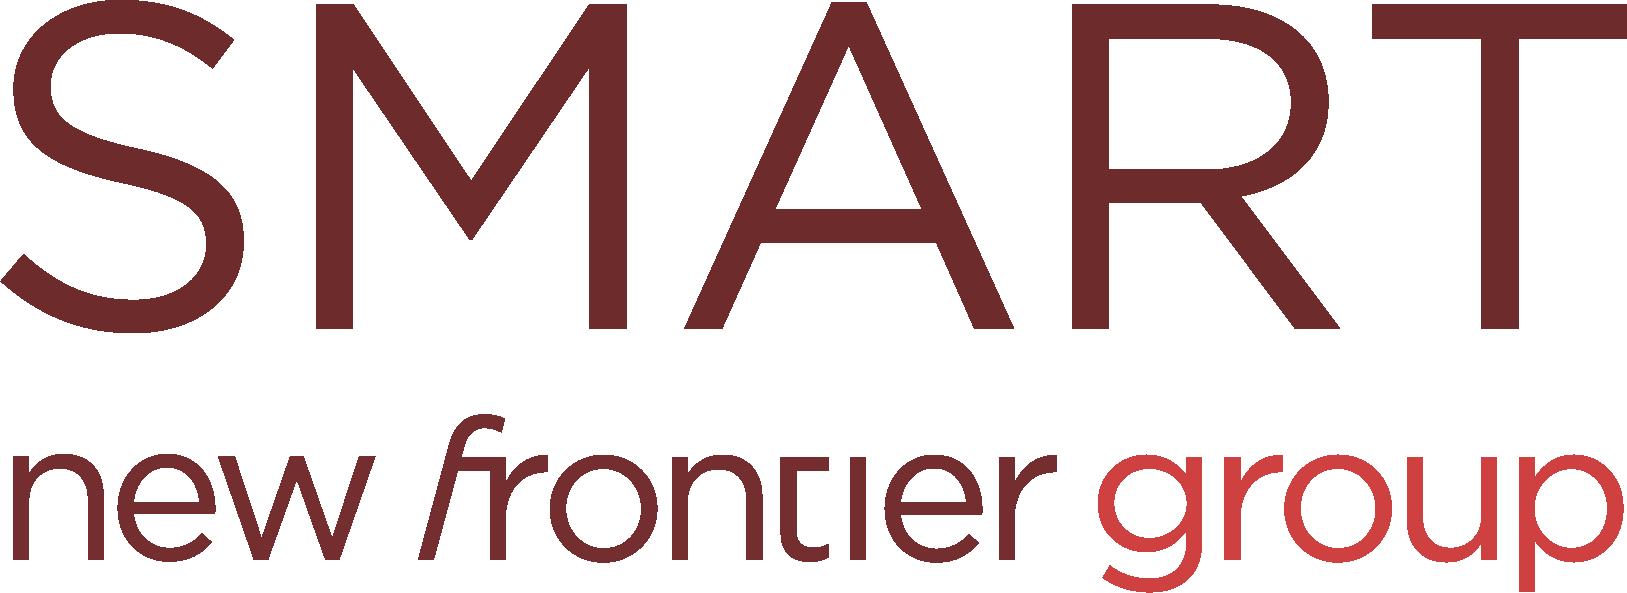 Smart NFG logo